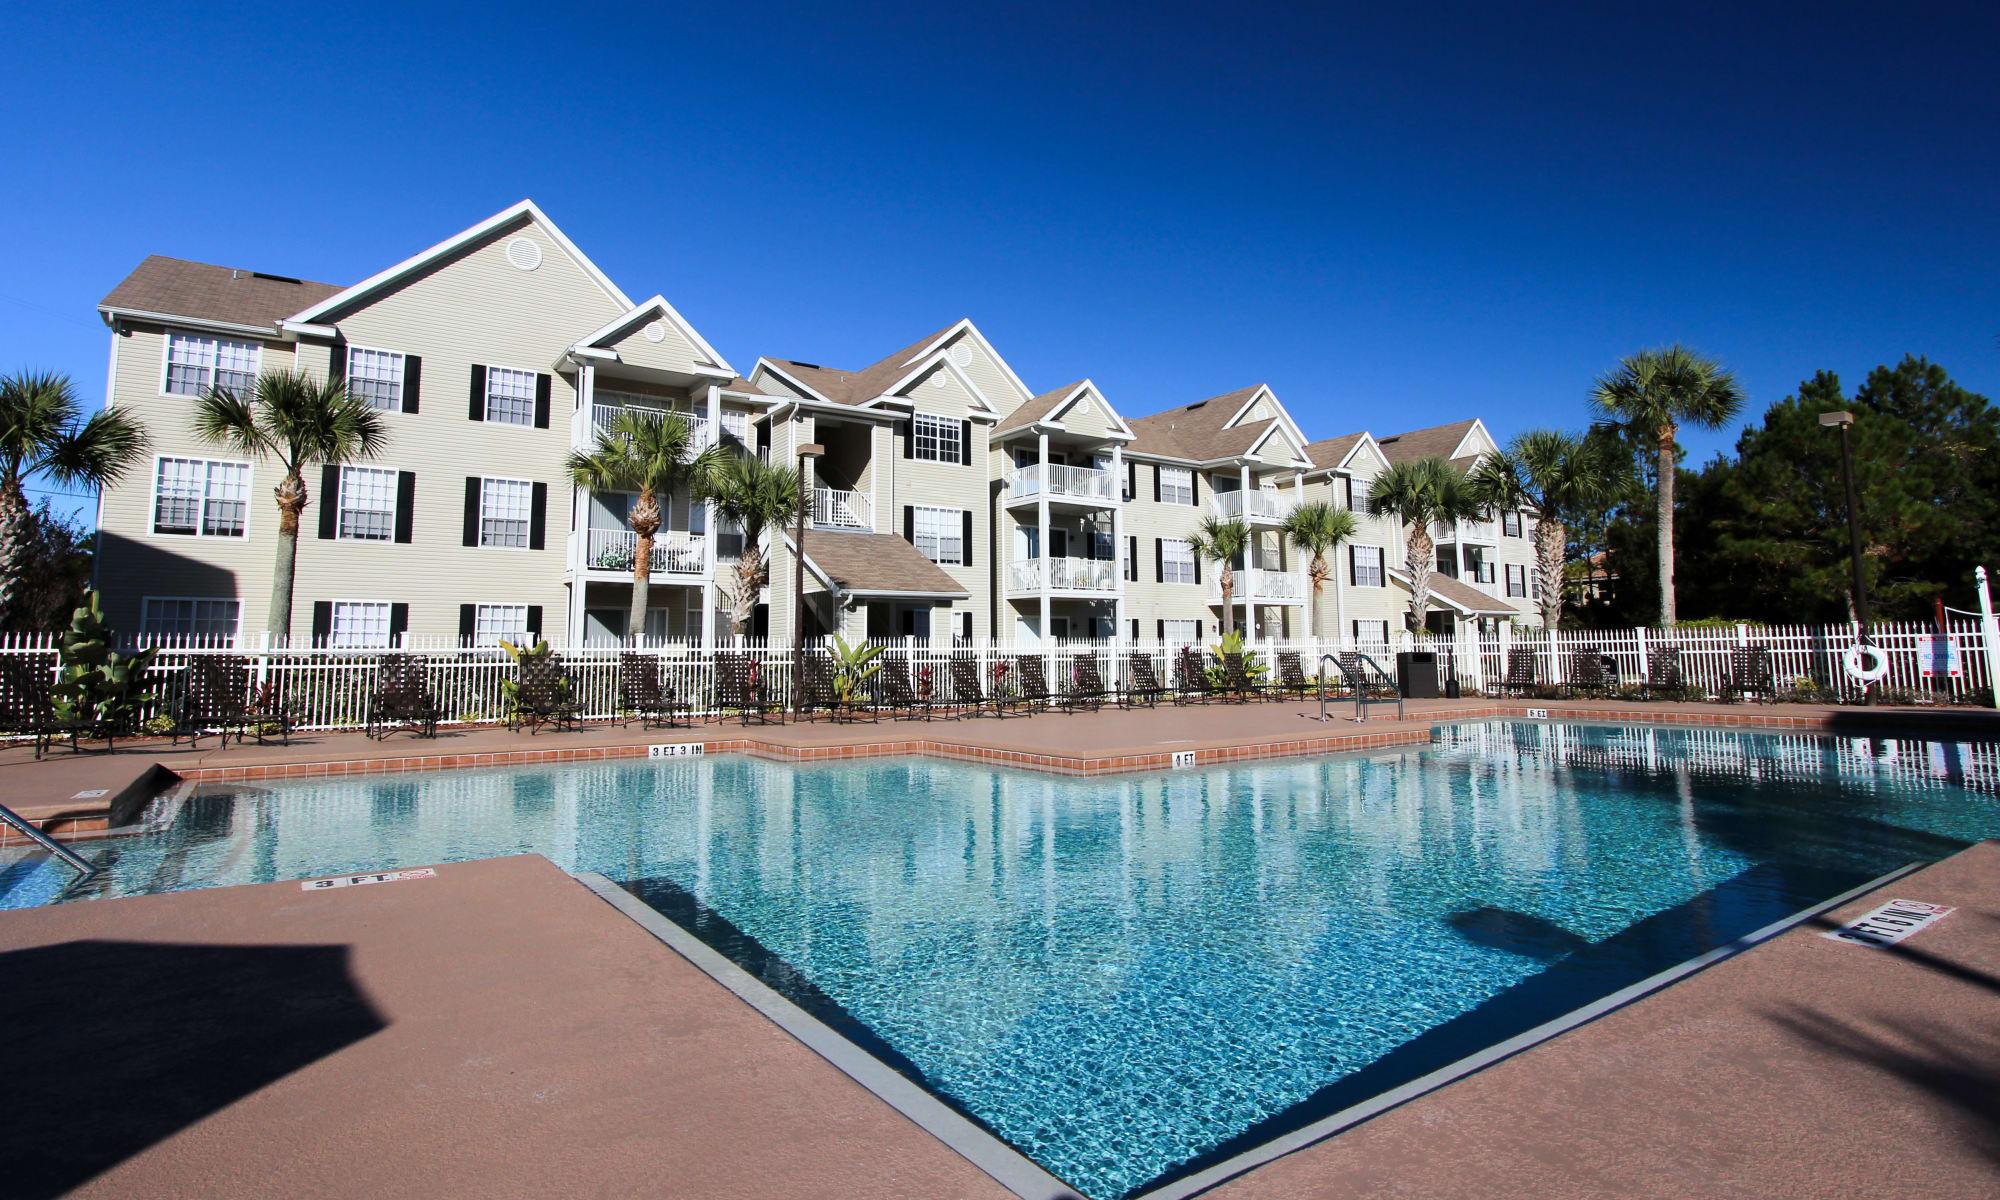 Apartments in New Port Richey, FL